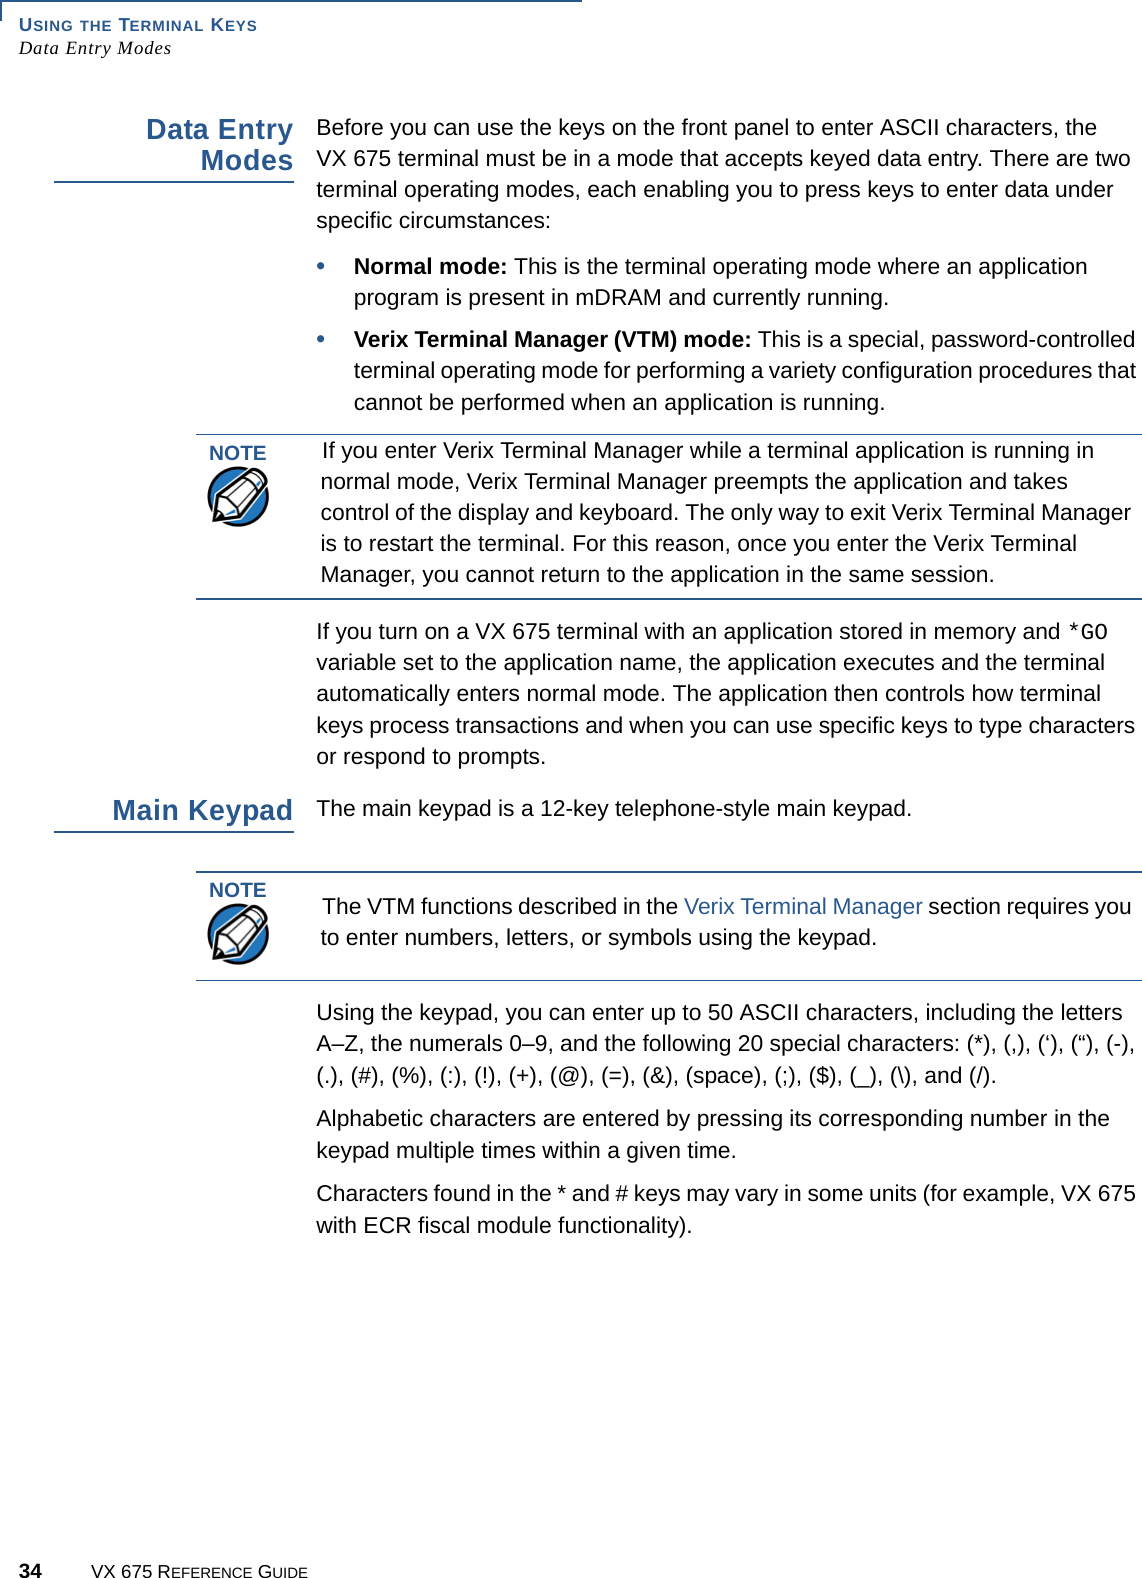 Verifone VX675WCDMA Point of Sale Terminal User Manual